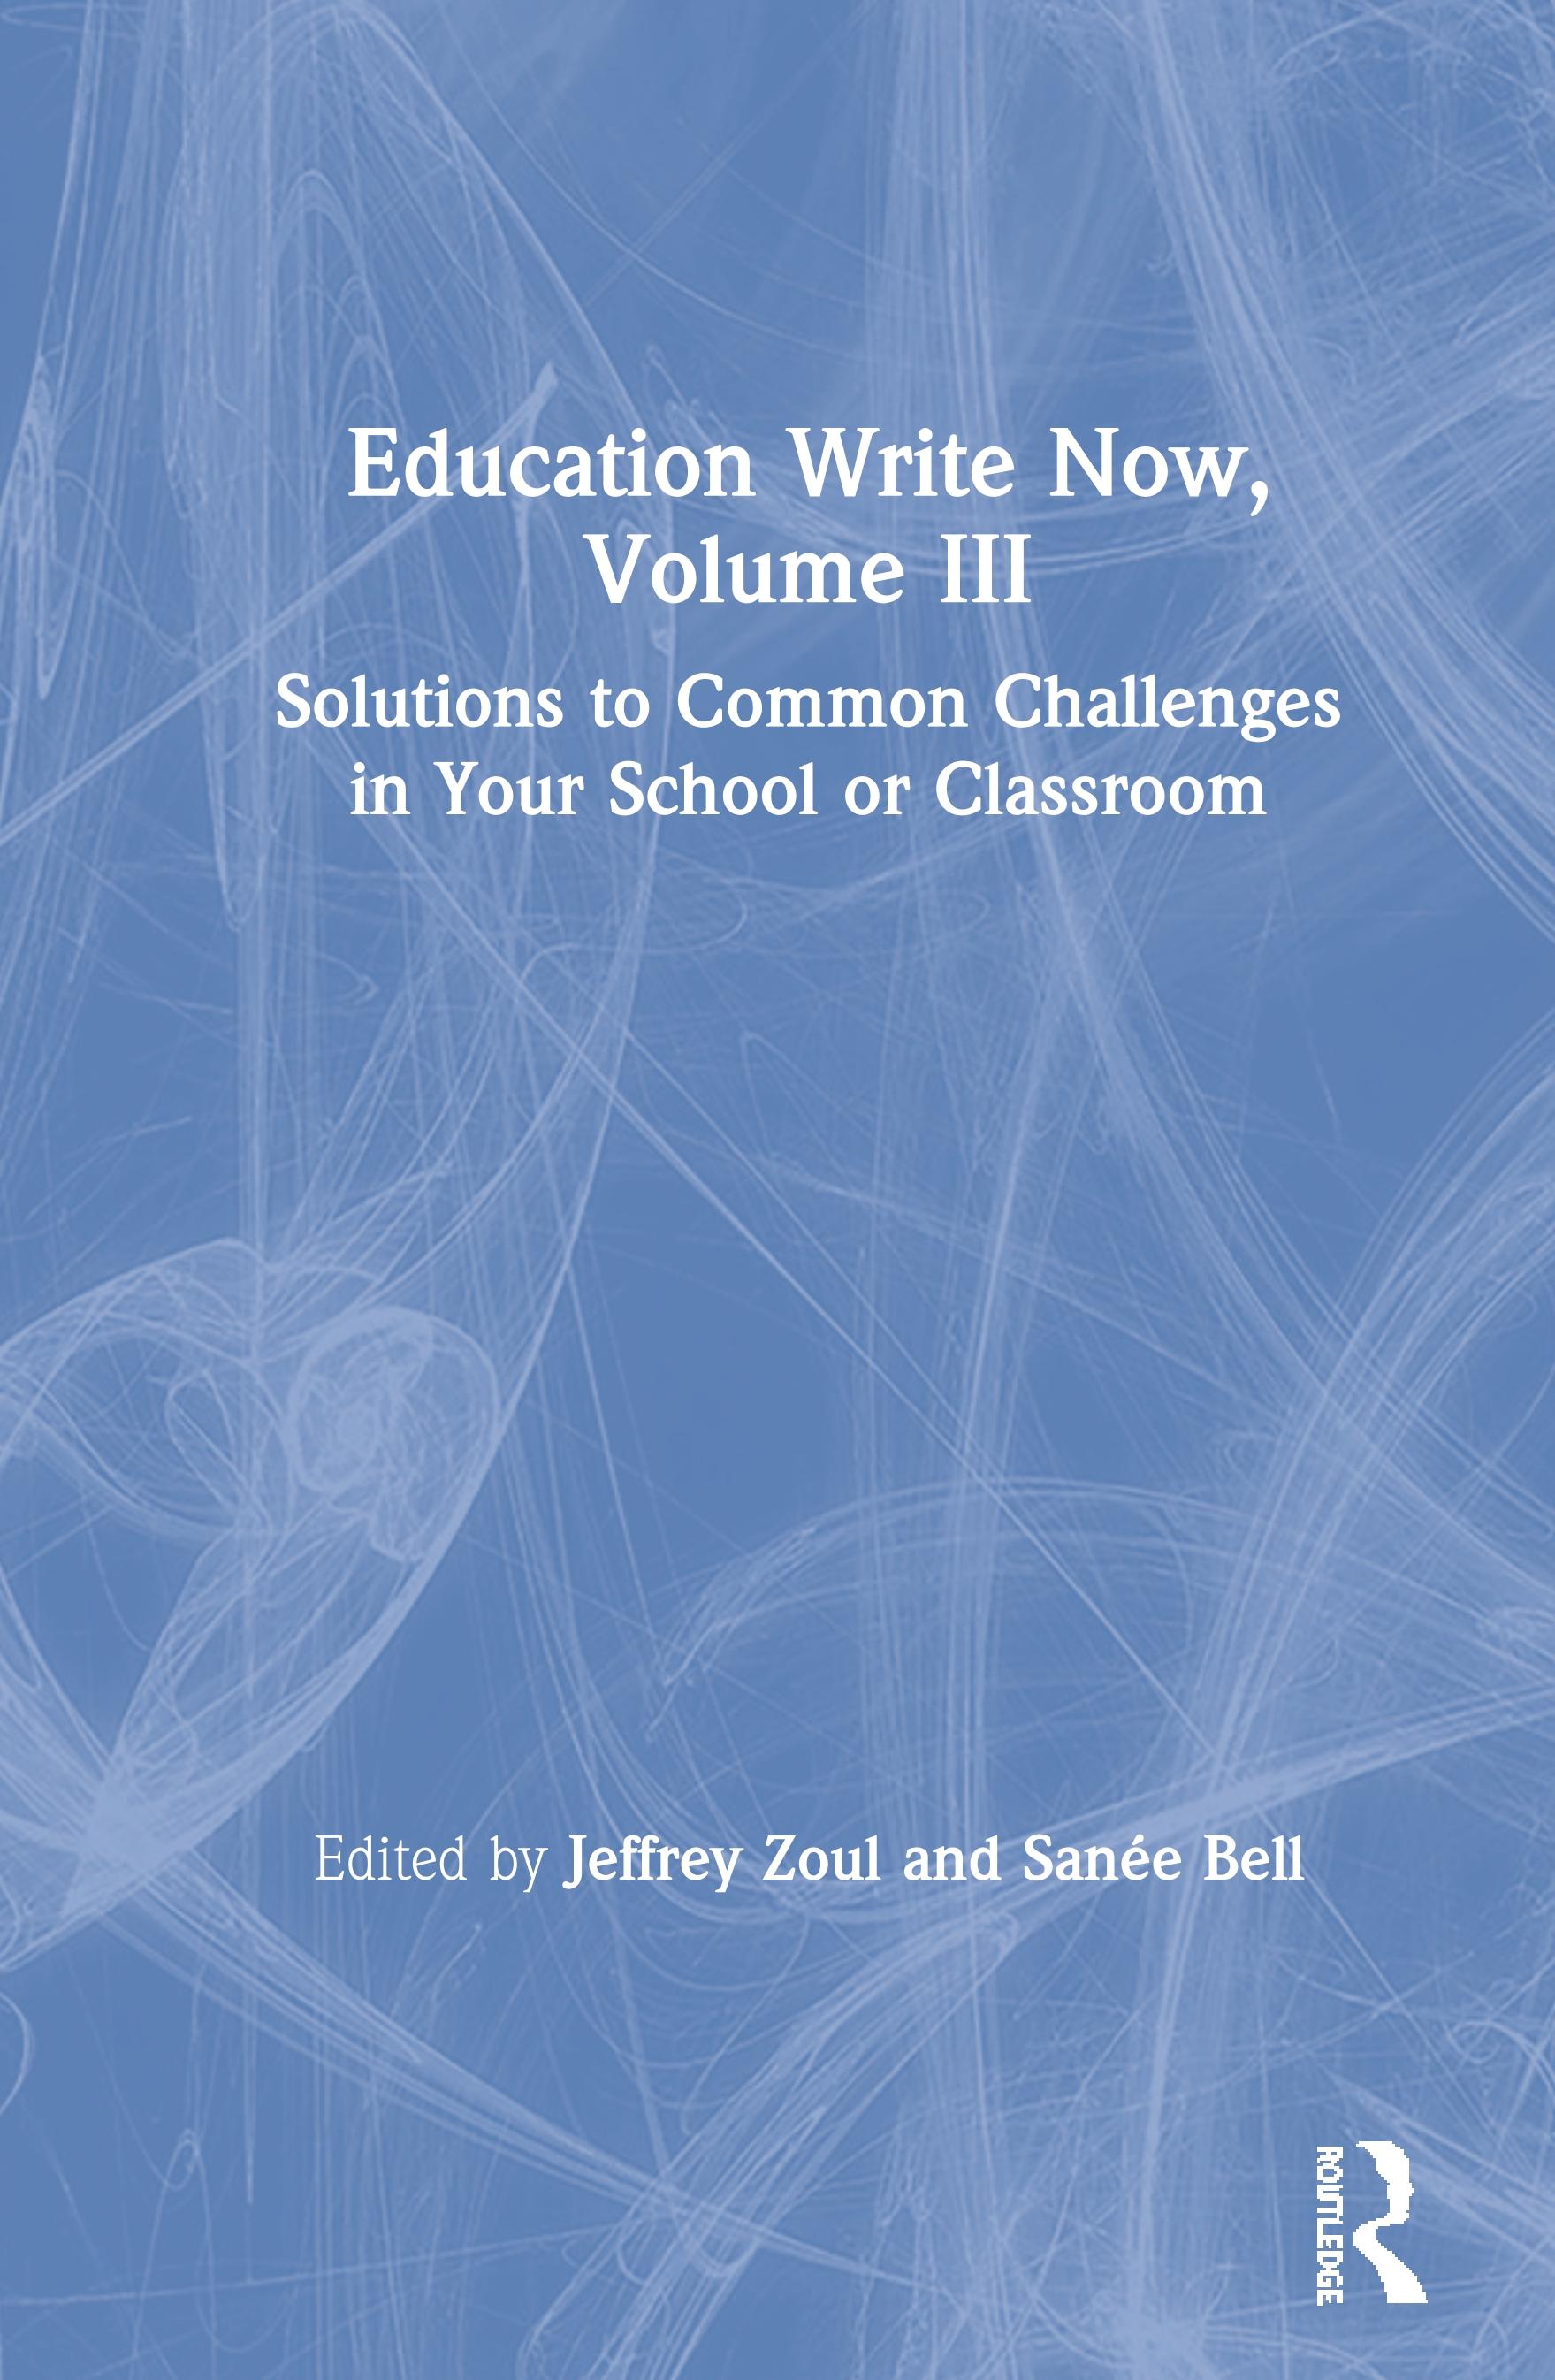 Education Write Now, Volume III